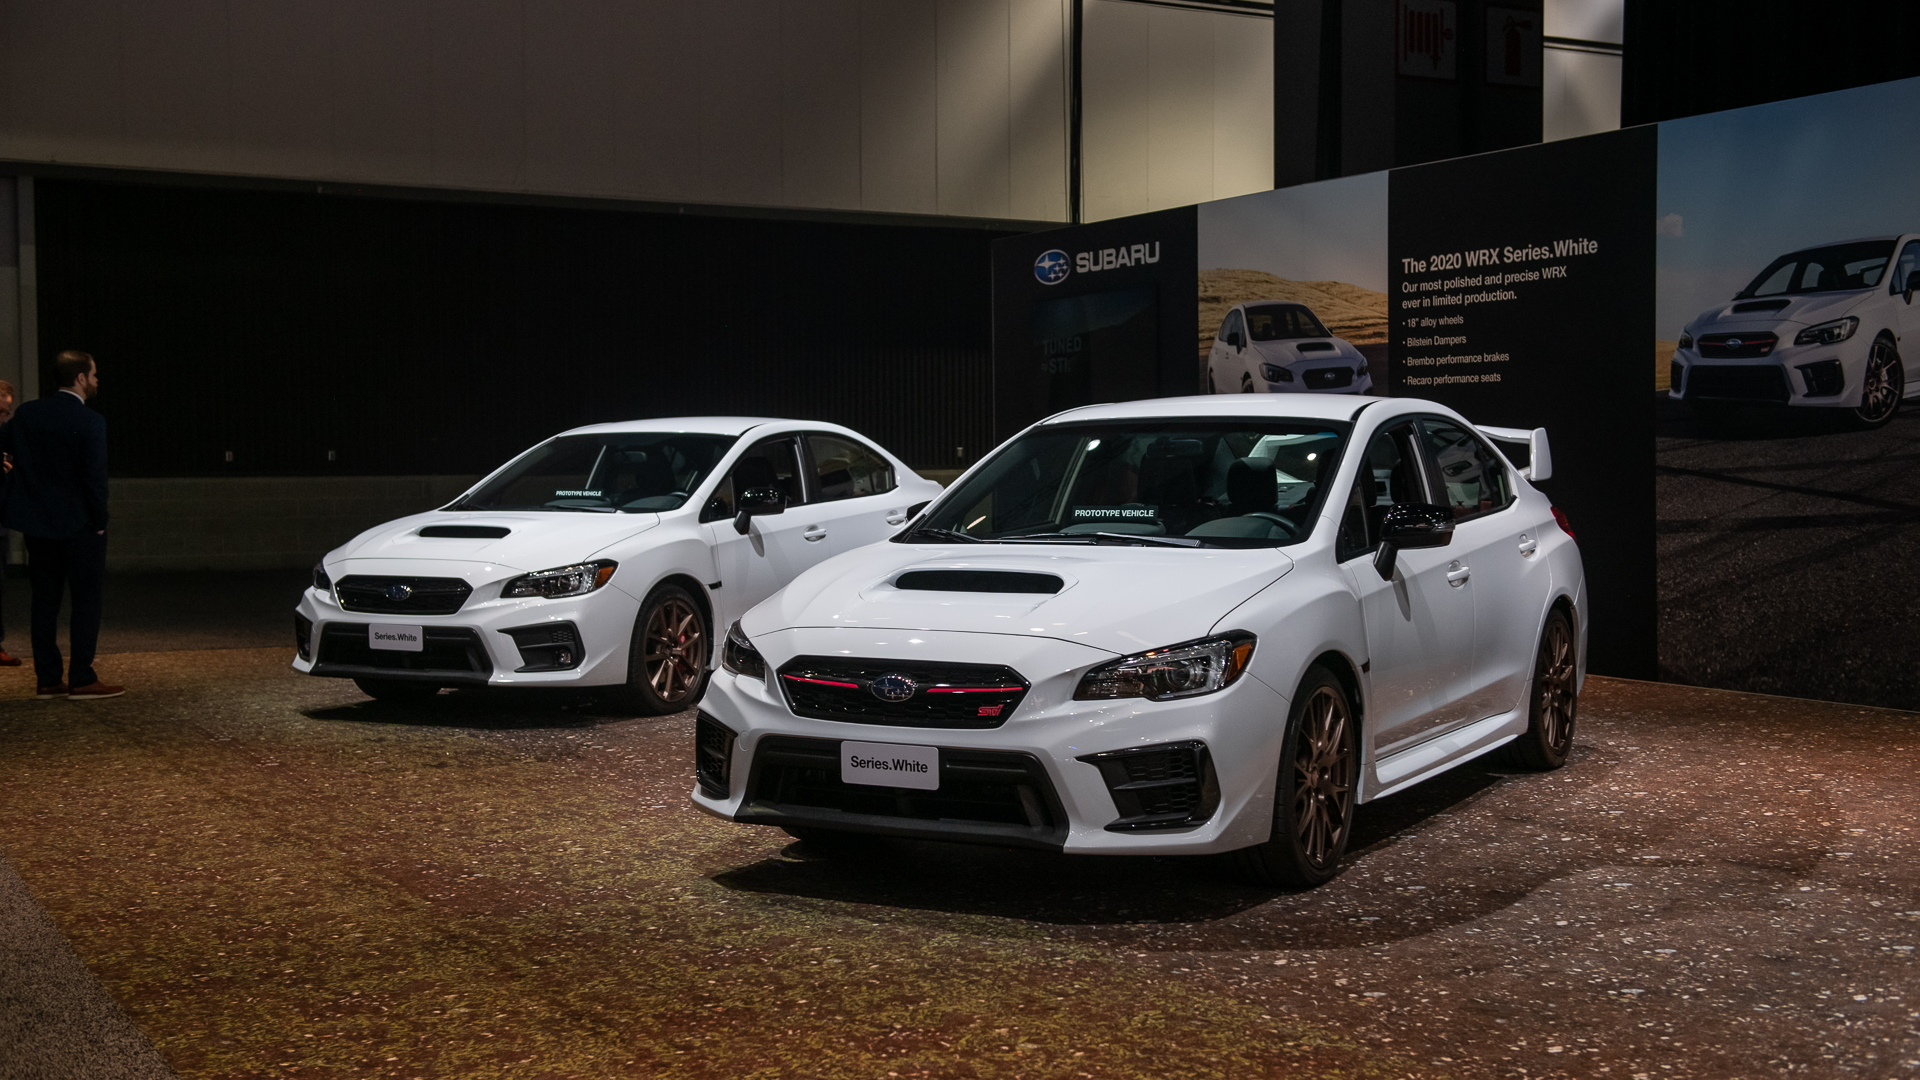 2020 Subaru Wrx And Wrx Sti Receive Series White Specials